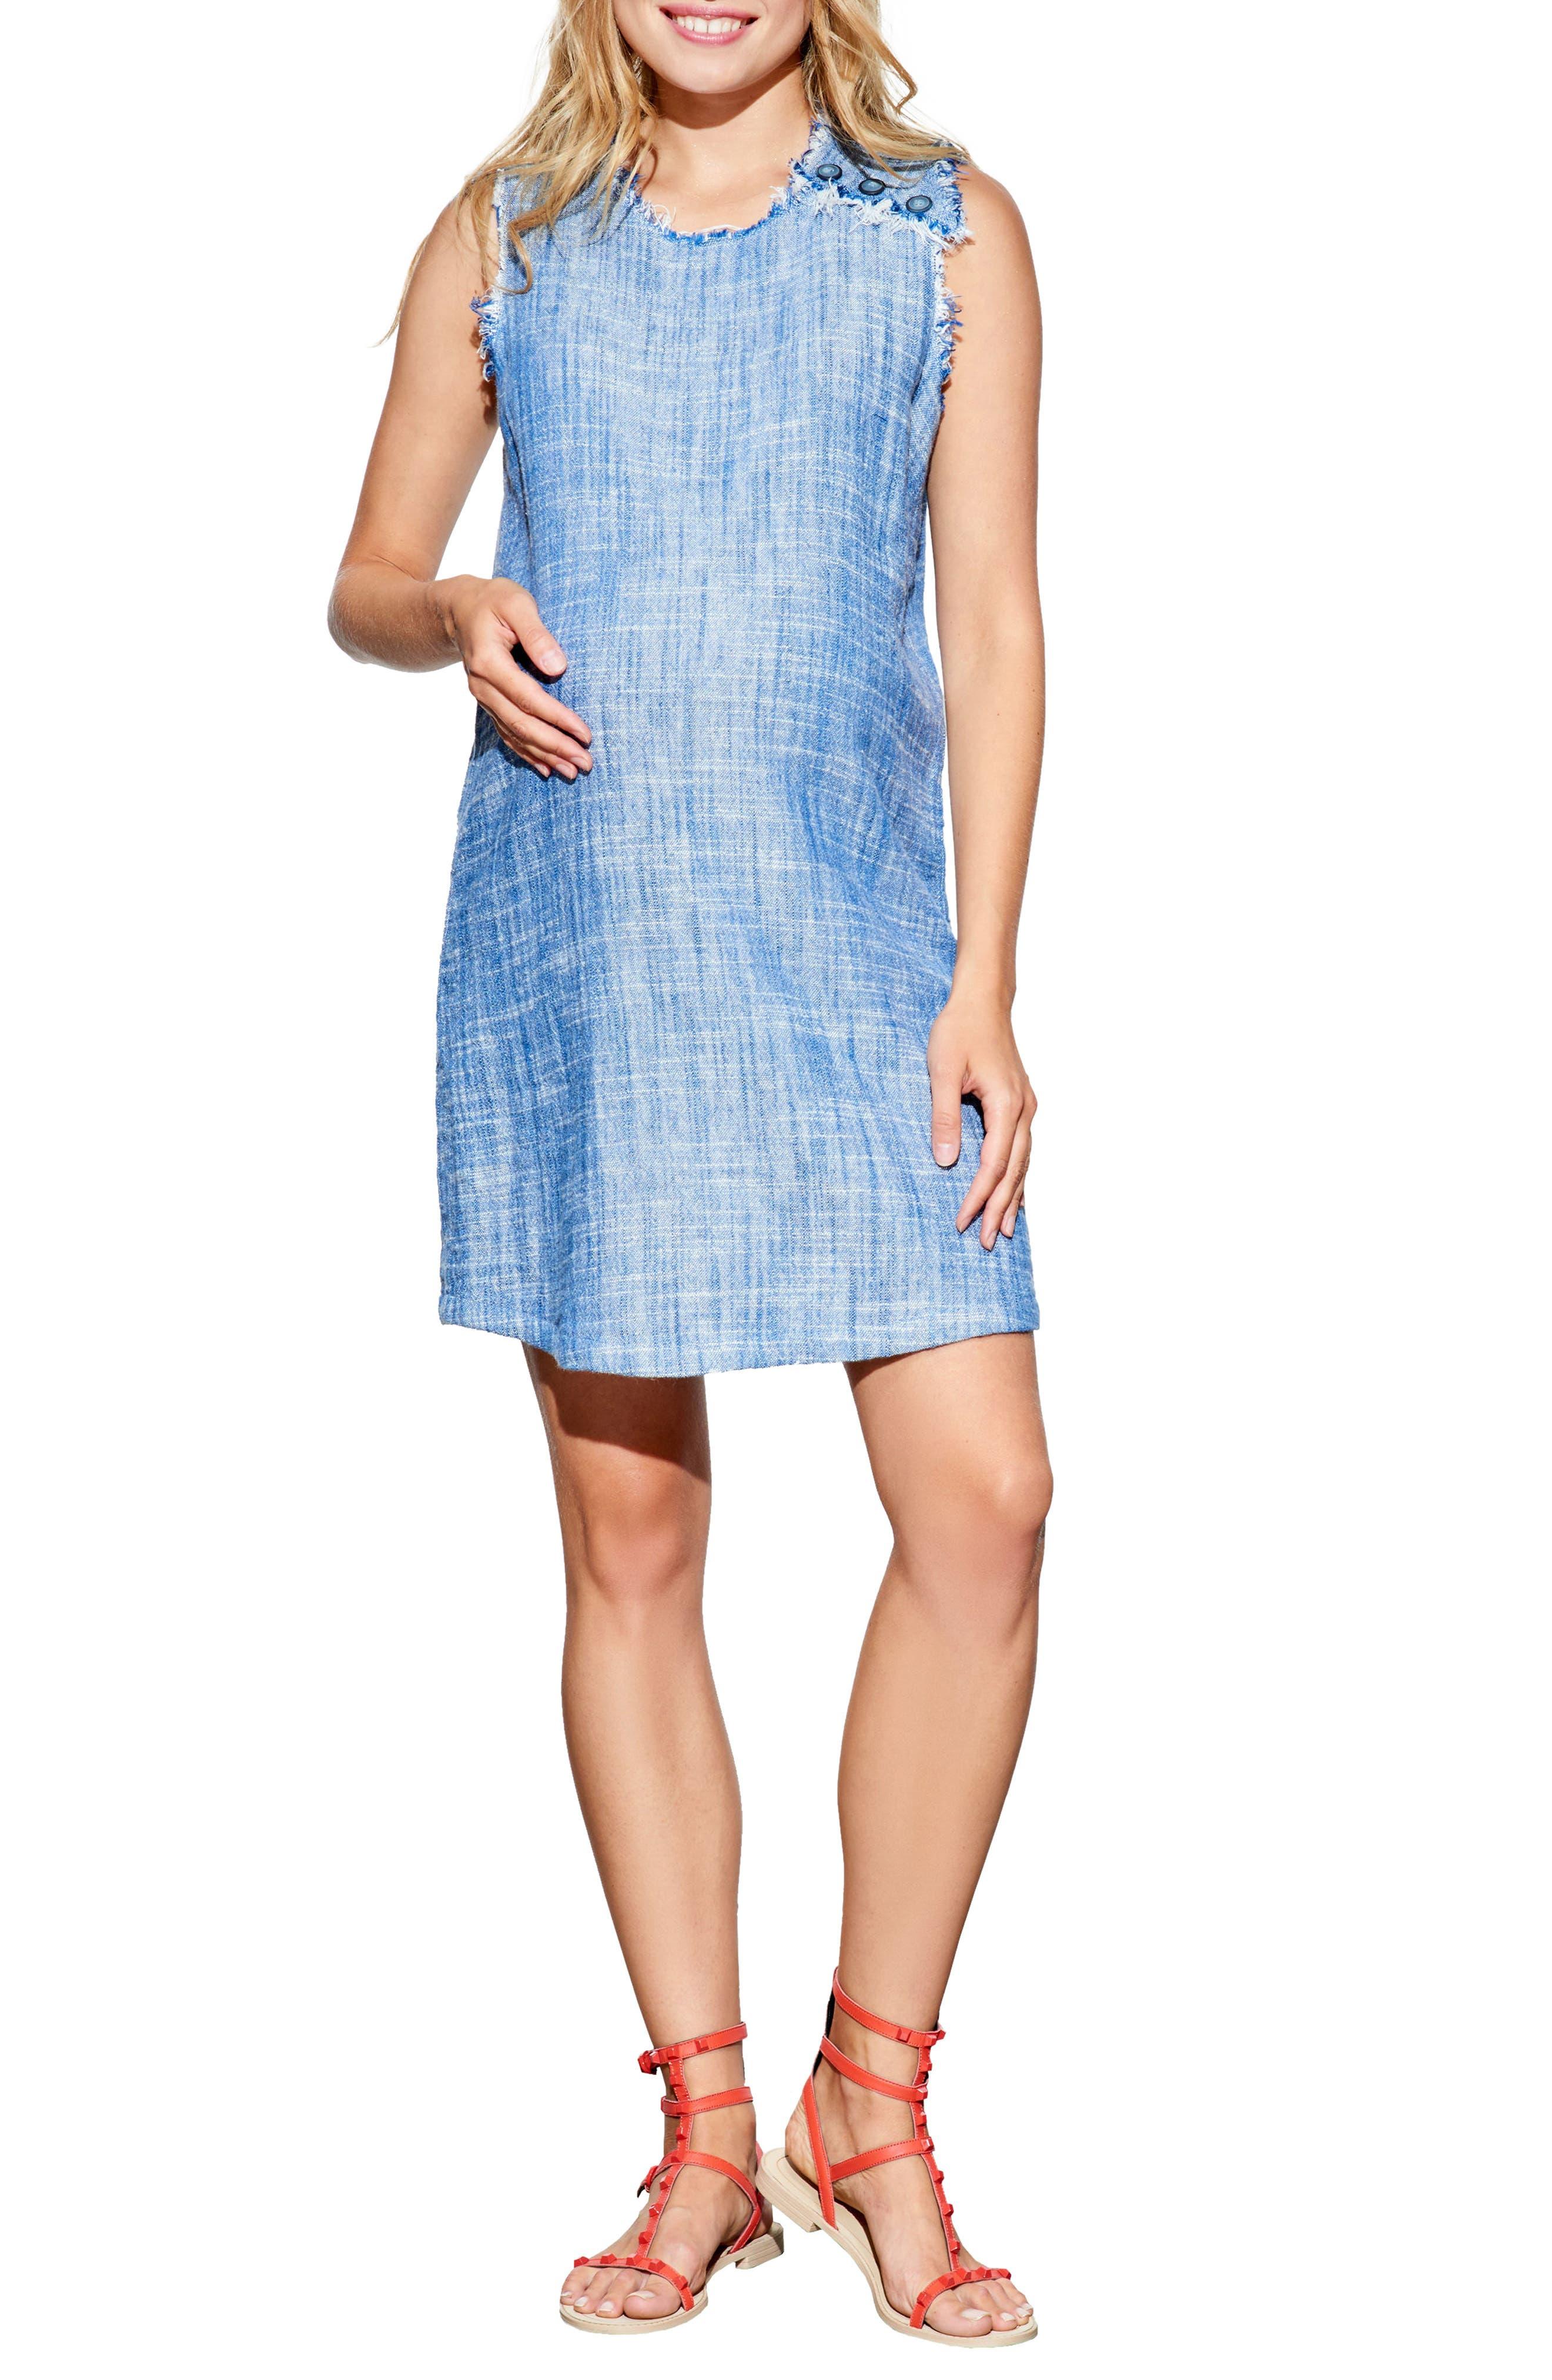 Maternal America Sleeveless Maternity Dress